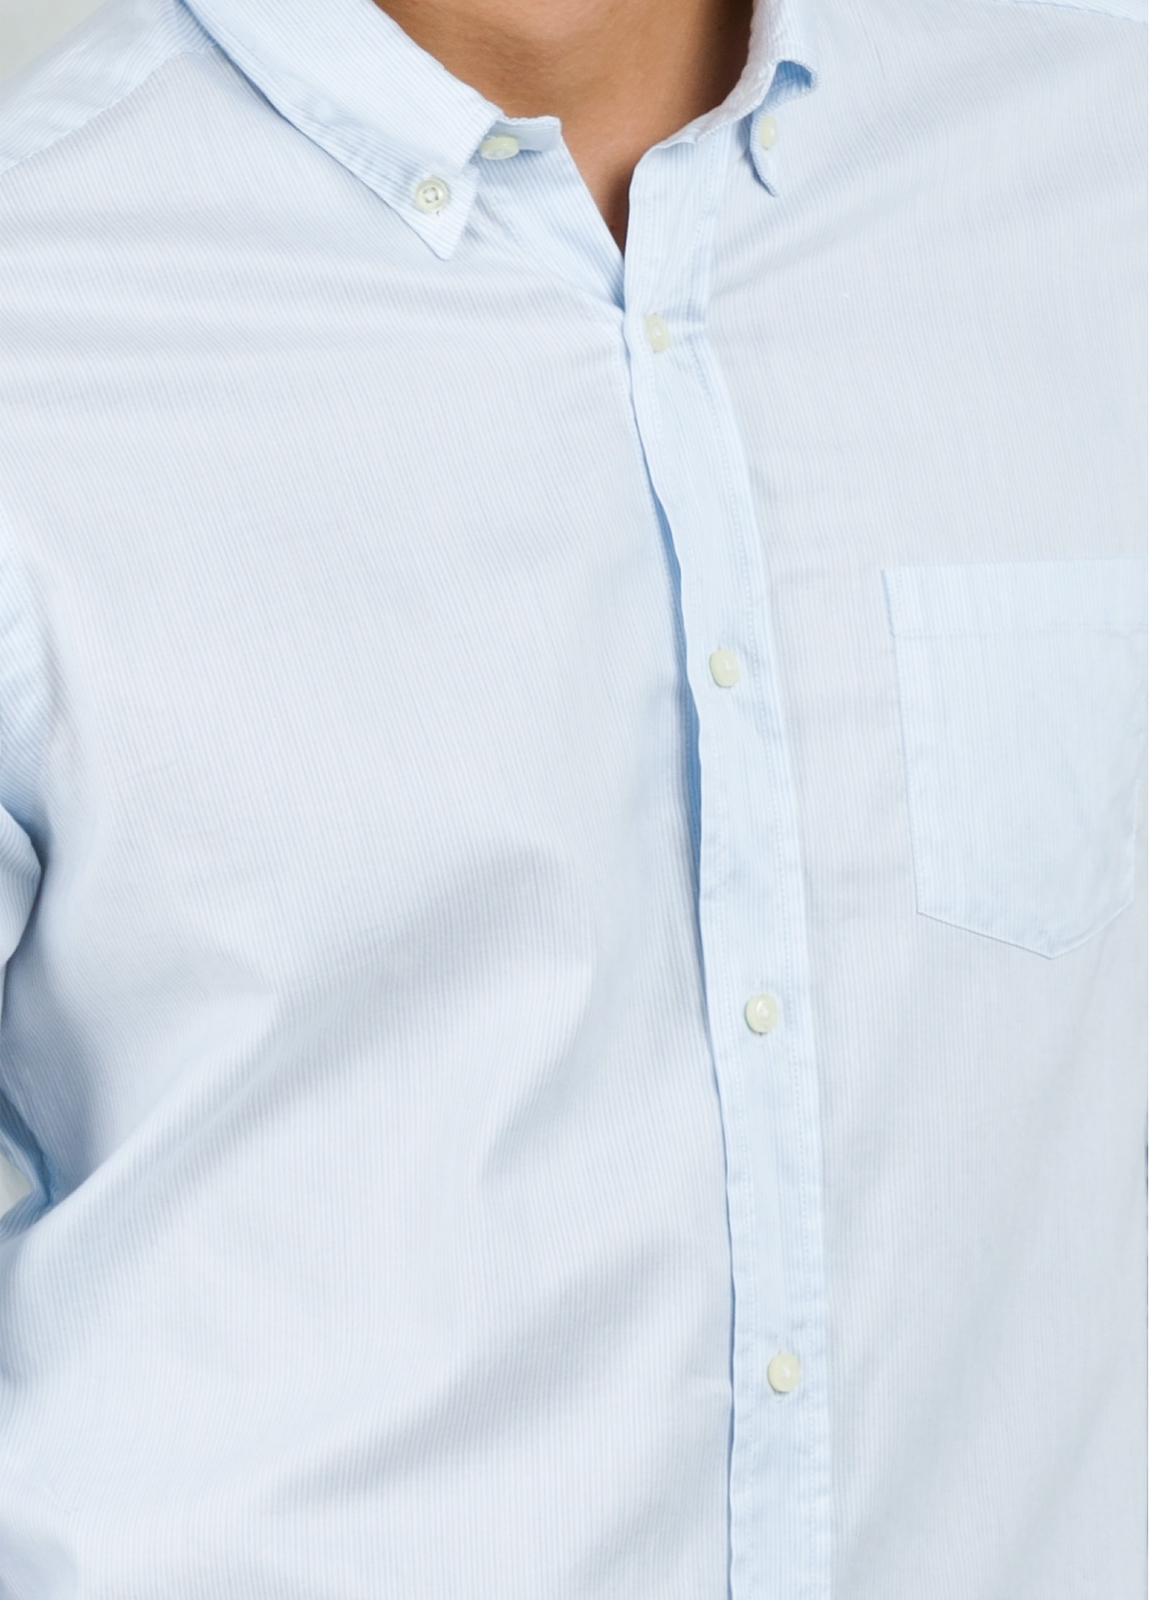 Camisa Leisure Wear REGULAR FIT Modelo BOTTON DOWN color celeste. 100% Algodón. - Ítem2